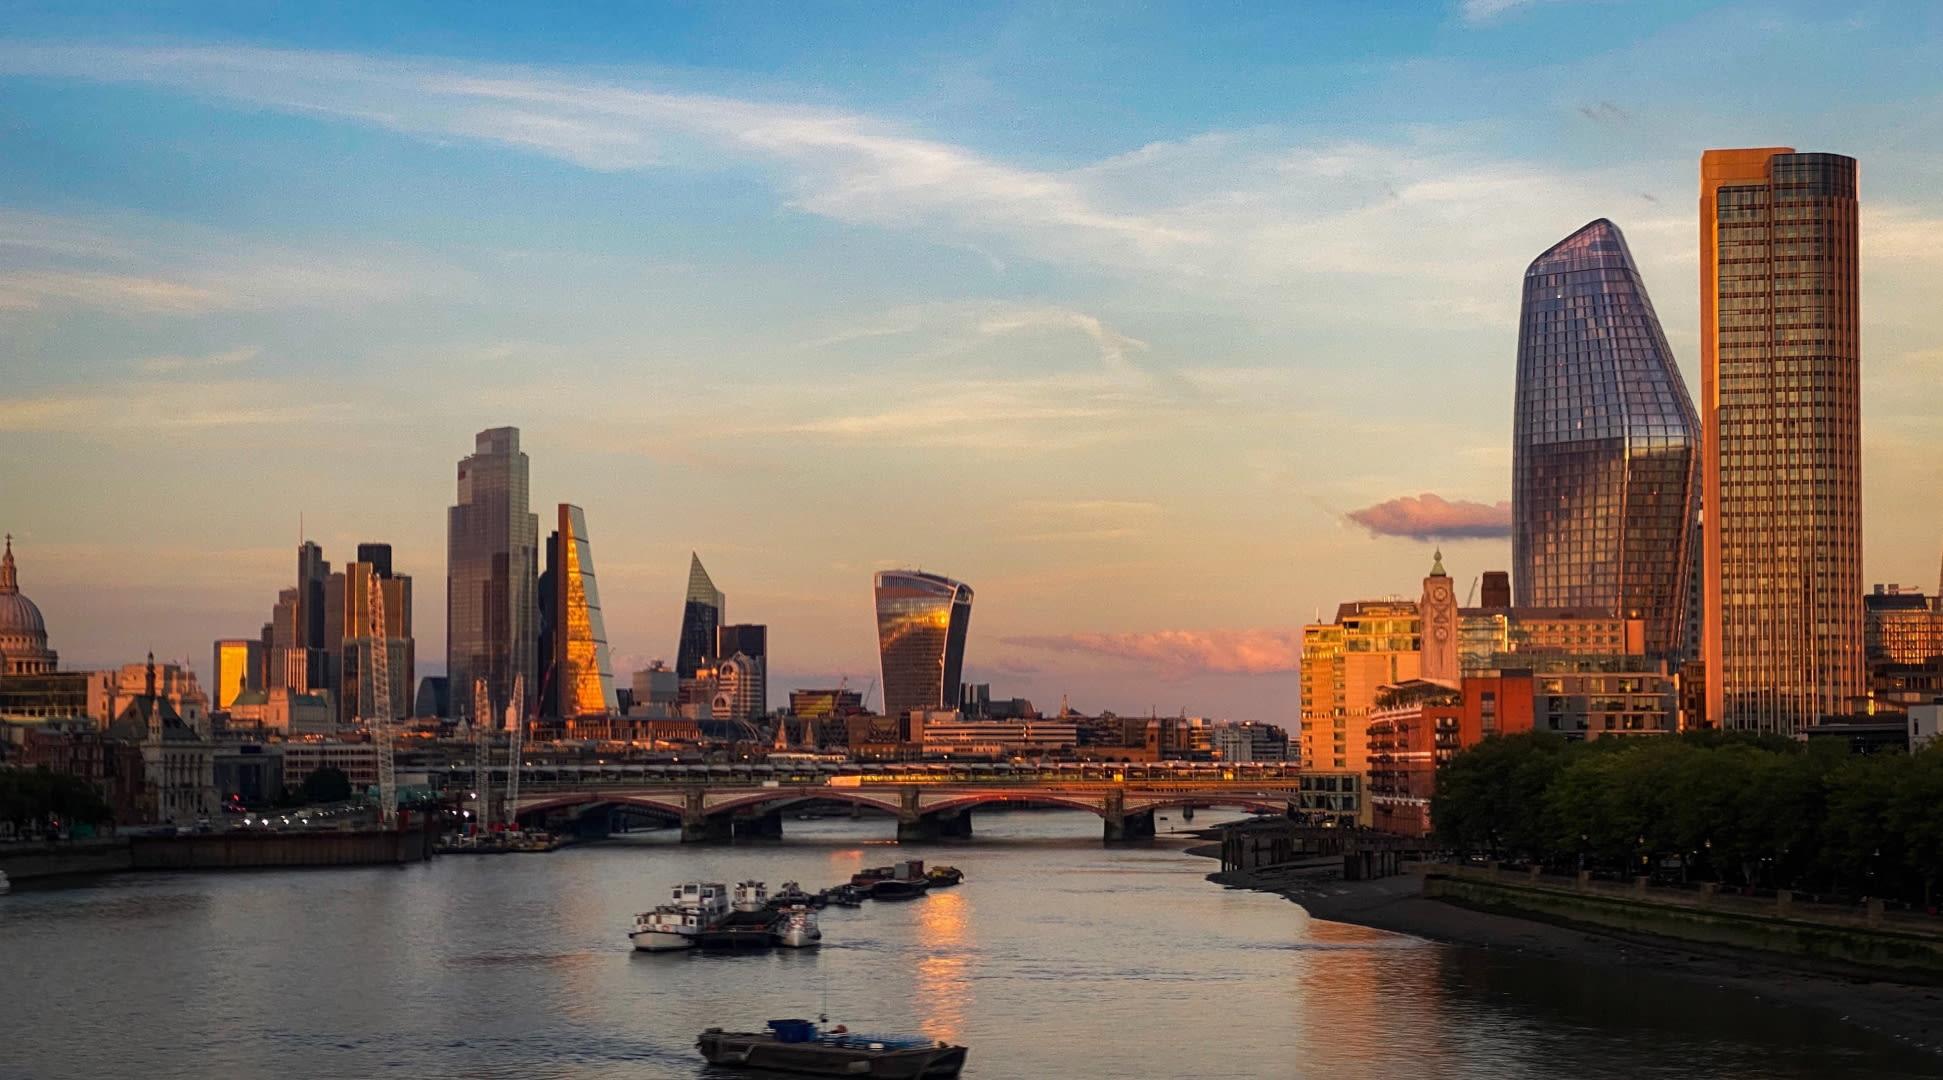 City of London - finance industry